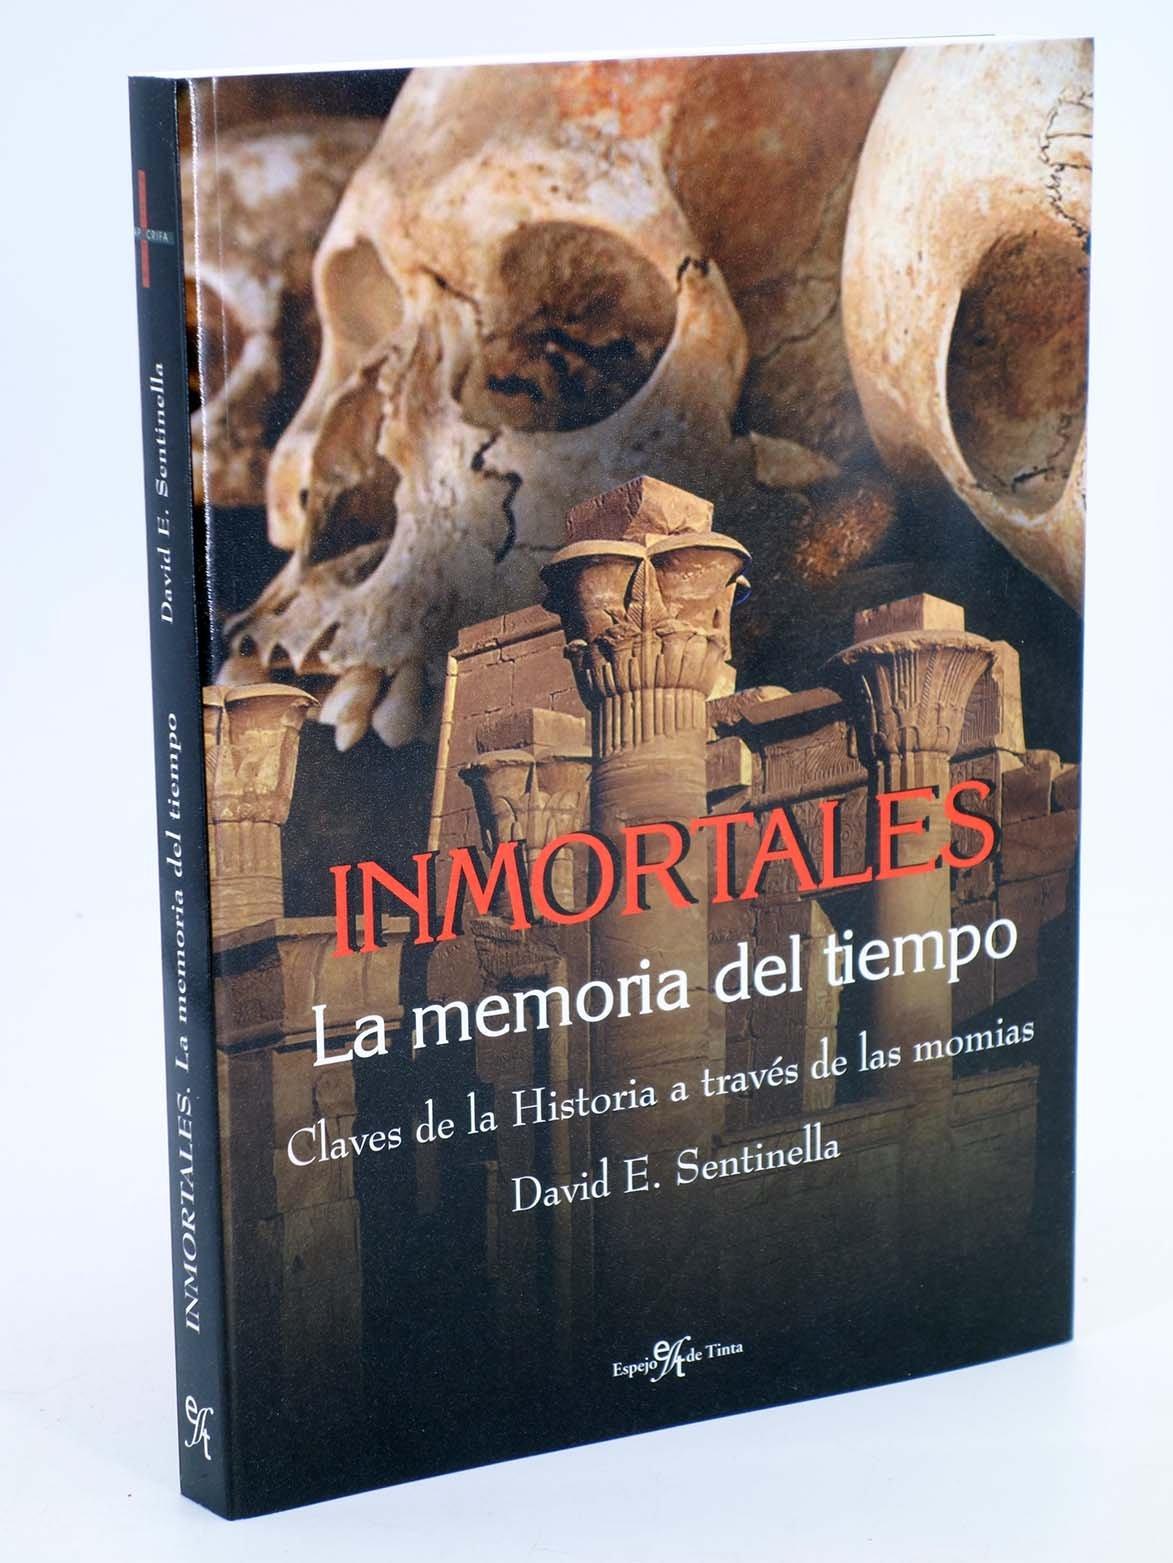 Inmortales. la memoria del tiempo: Amazon.es: David E. Sentinella: